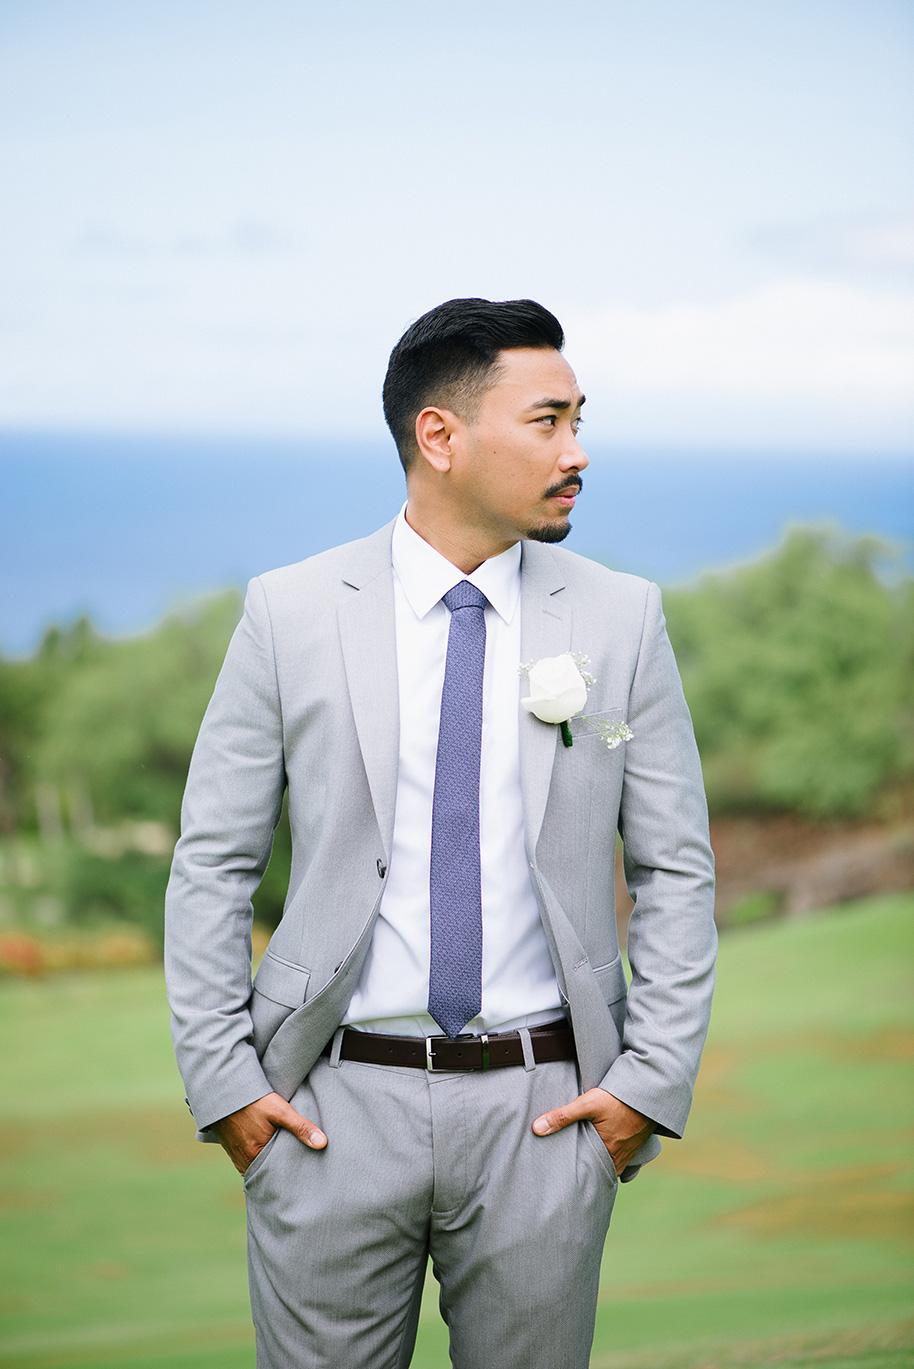 Maui-Wedding-052416-3